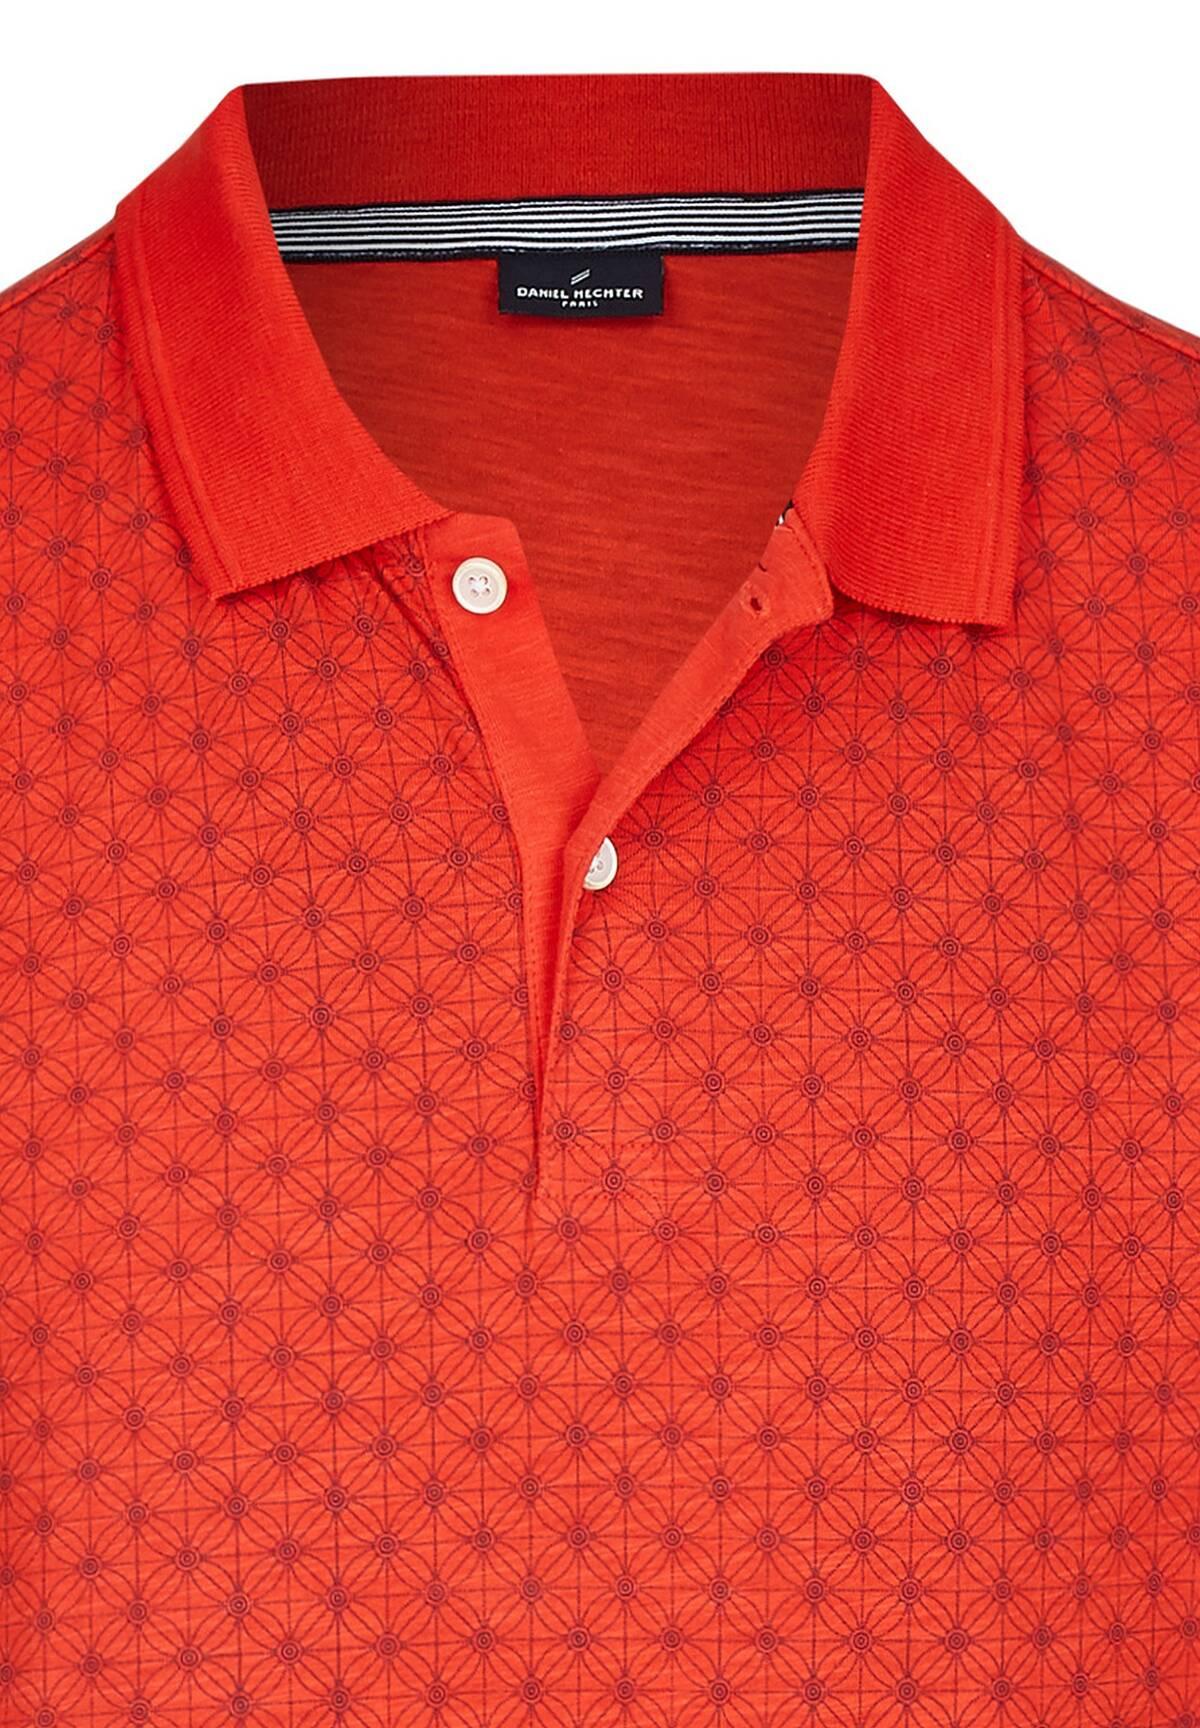 Grafik Polo Shirt / POLO JERSEY WASHED